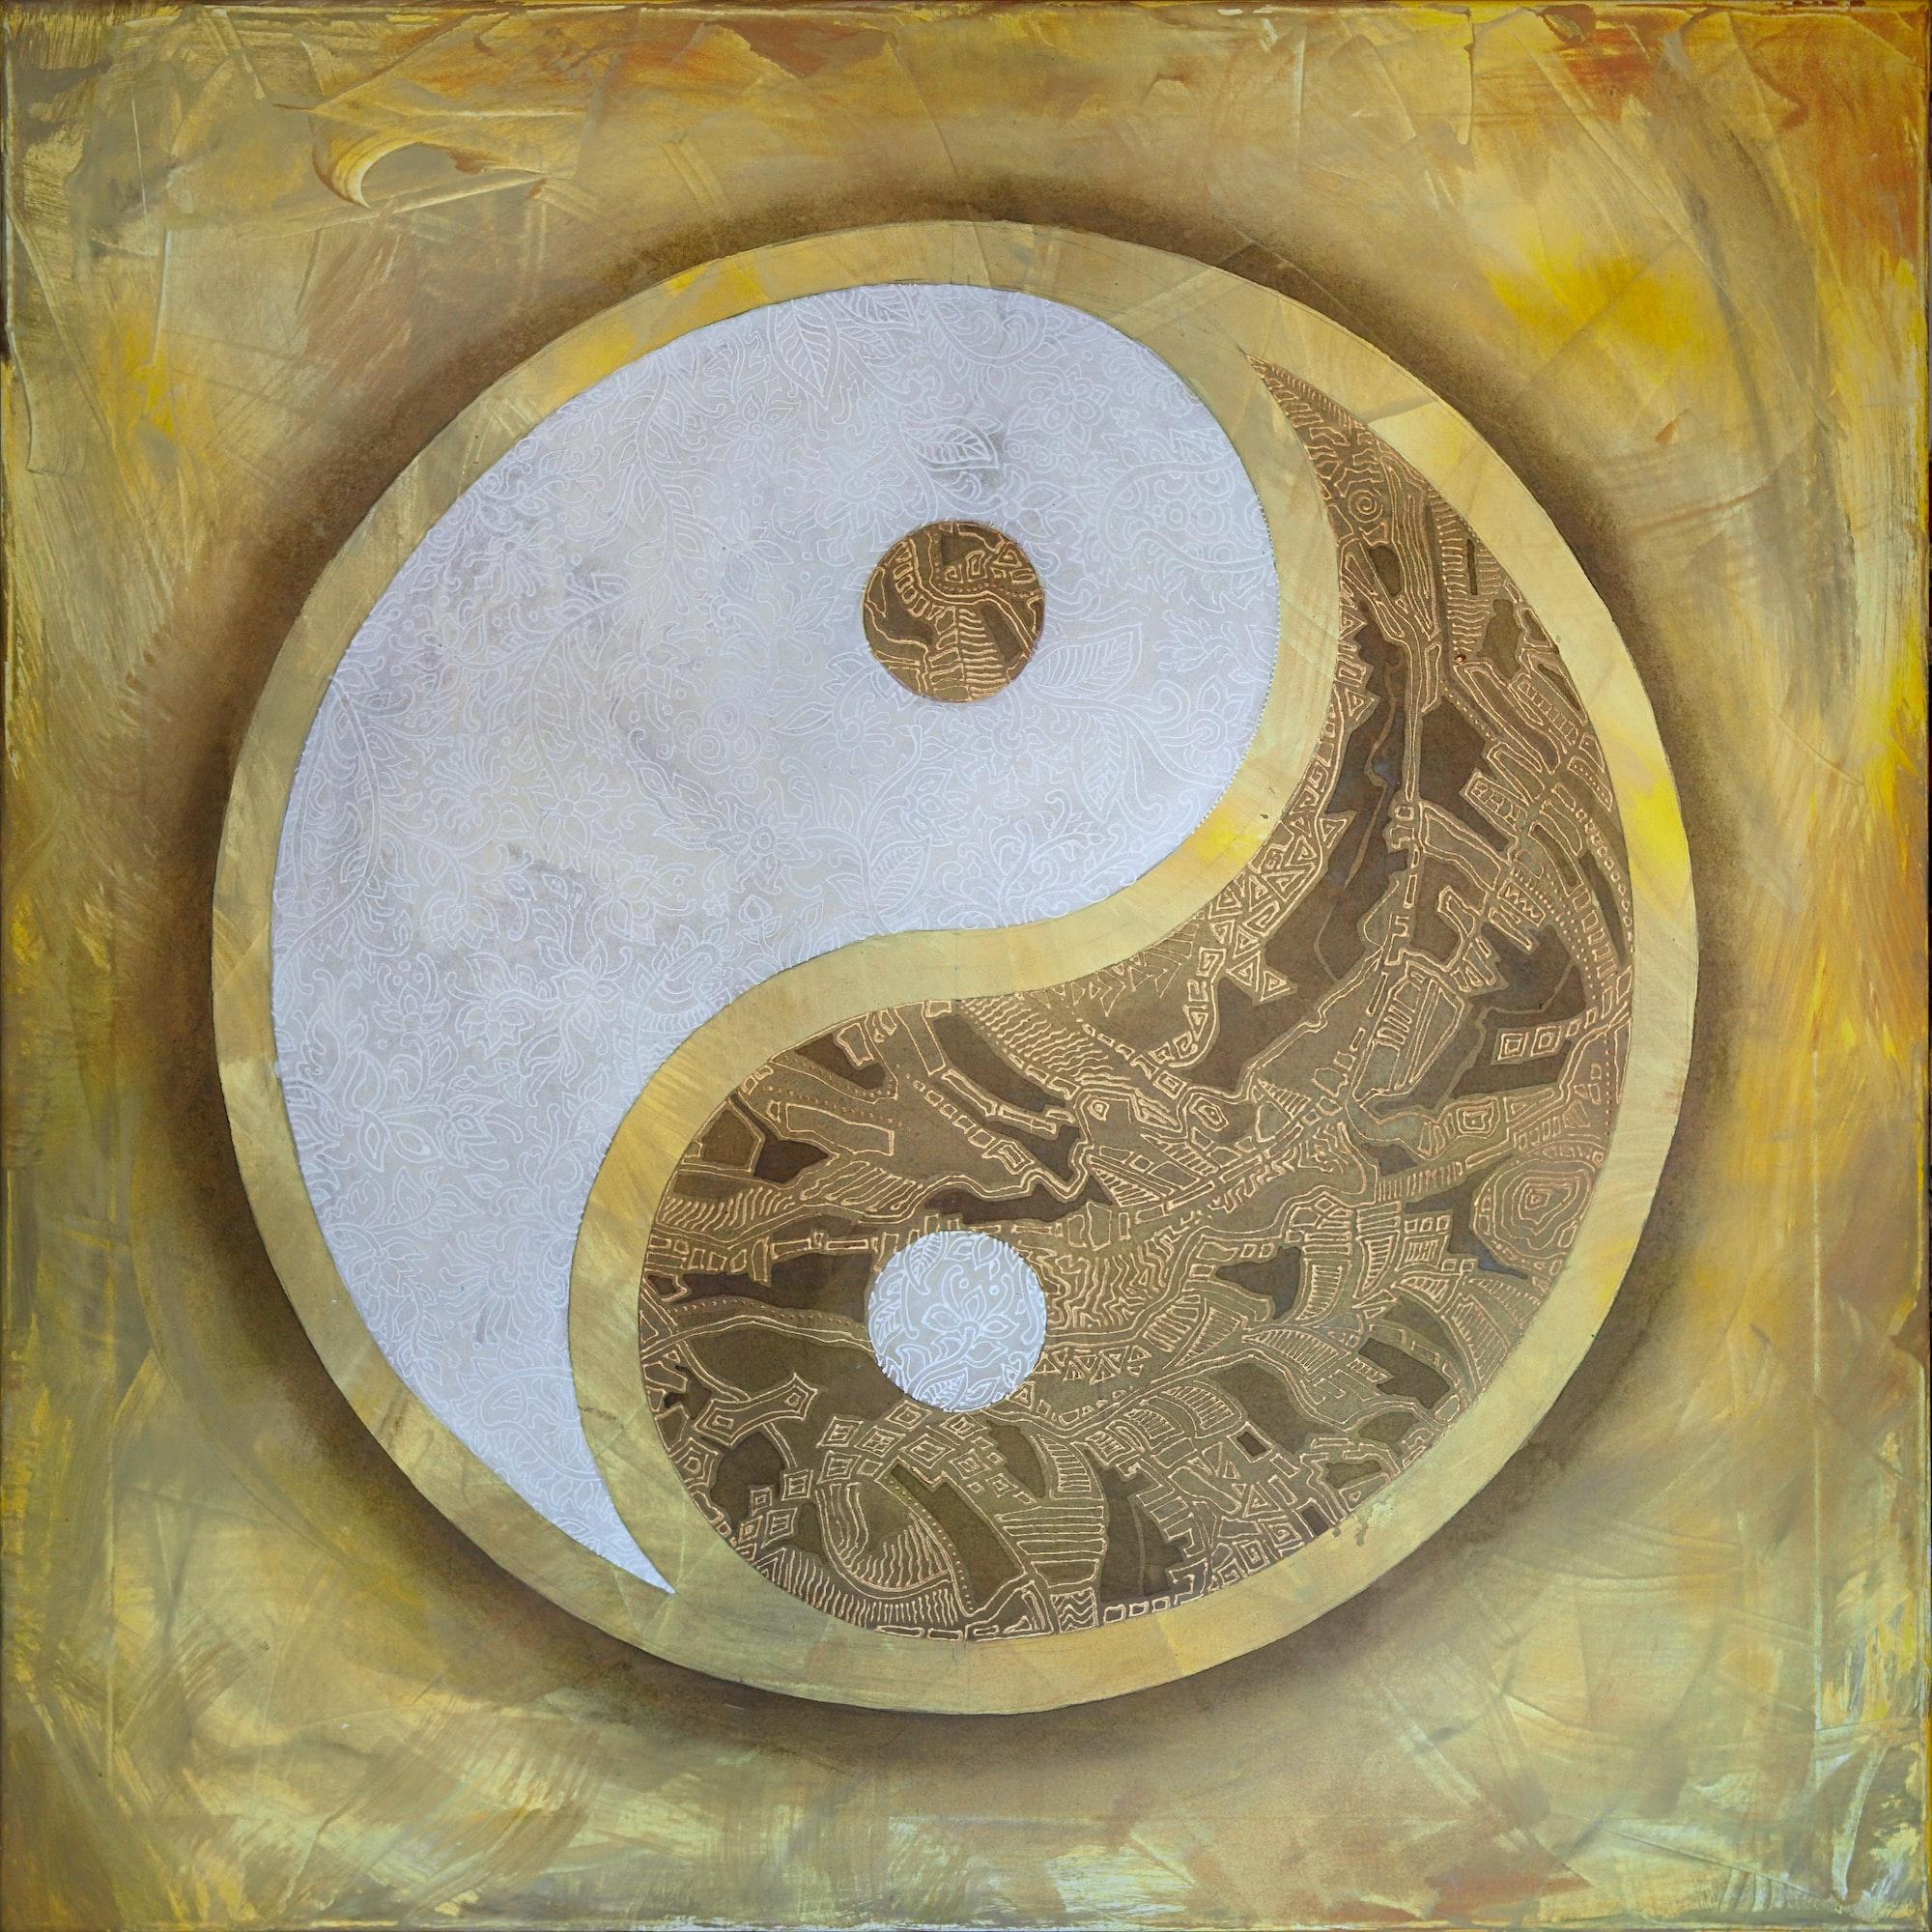 Yin Yang. A cozy picture in calm warm colors. The symbol is richly decorated with flowers and abstract lines. ■(RUS) Инь-Ян. Уютная картина в спокойных теплых тонах. Символ богато декорирован цветами и абстрактными линиями.